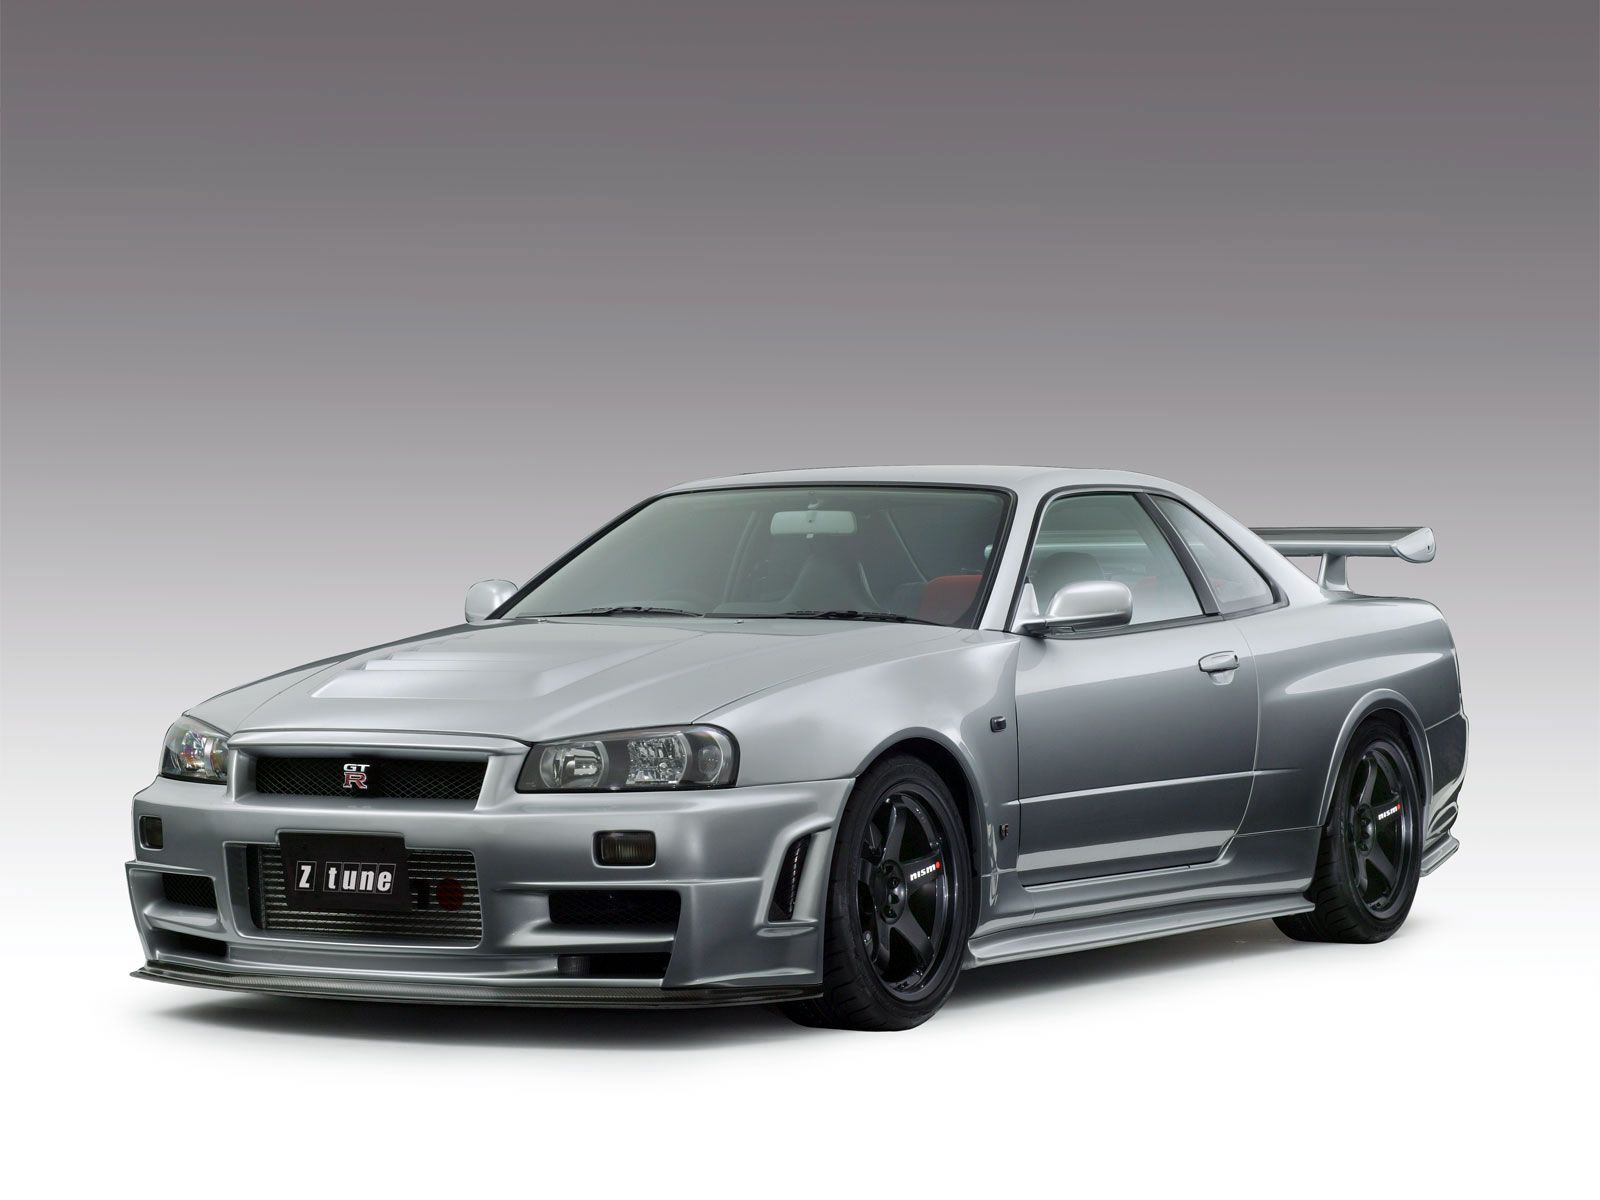 2007 Nissan Skyline, Nissan Skyline GT R NISMO Z Tune 20 Made ...